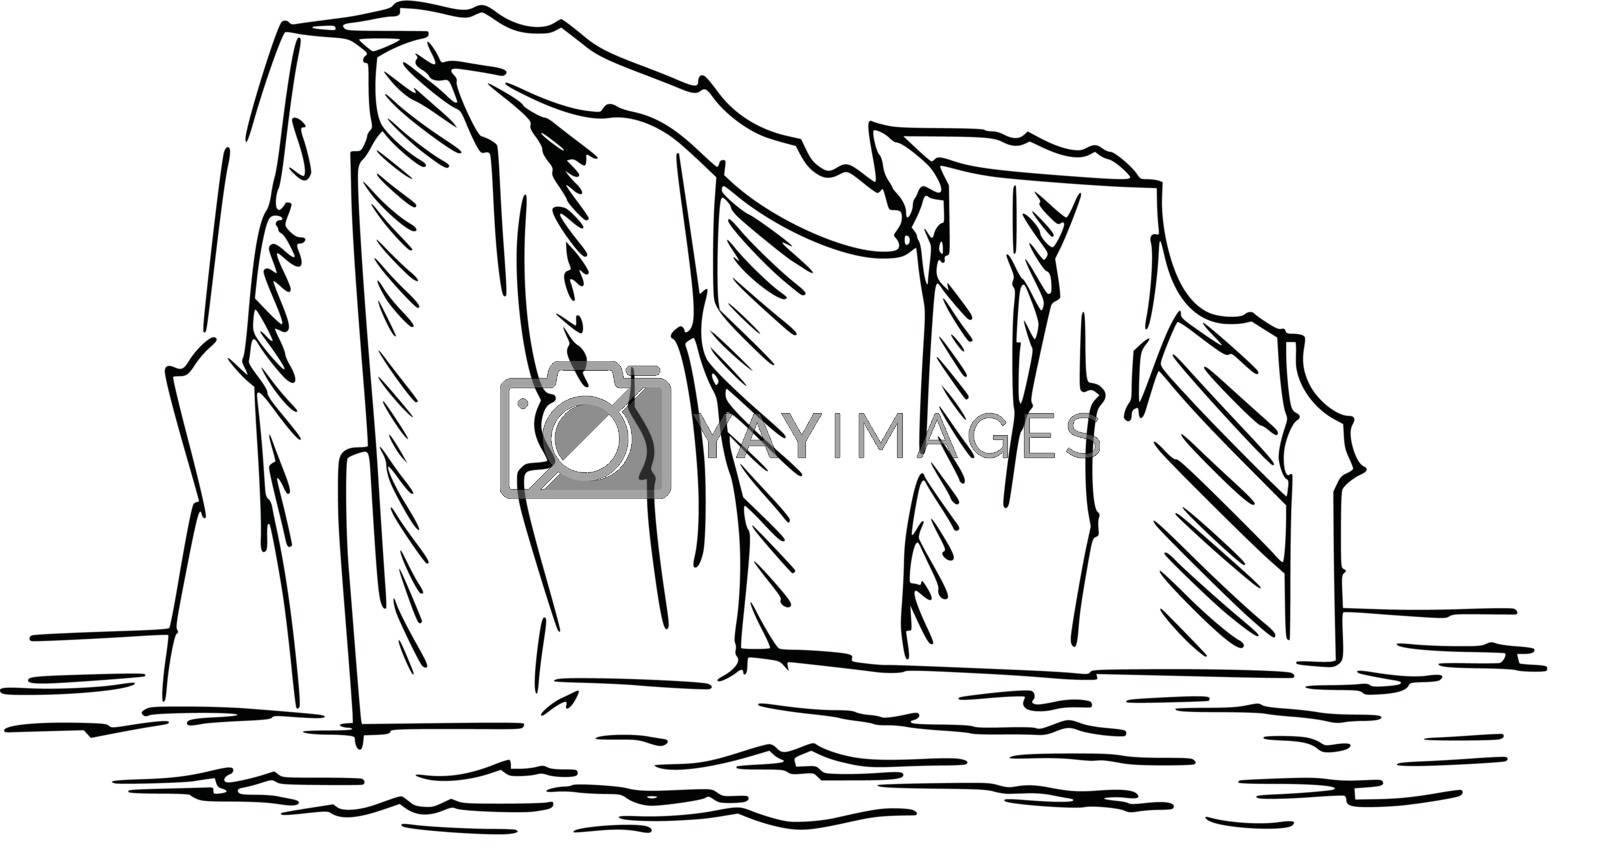 hand drawn, cartoon, sketch illustration of iceberg